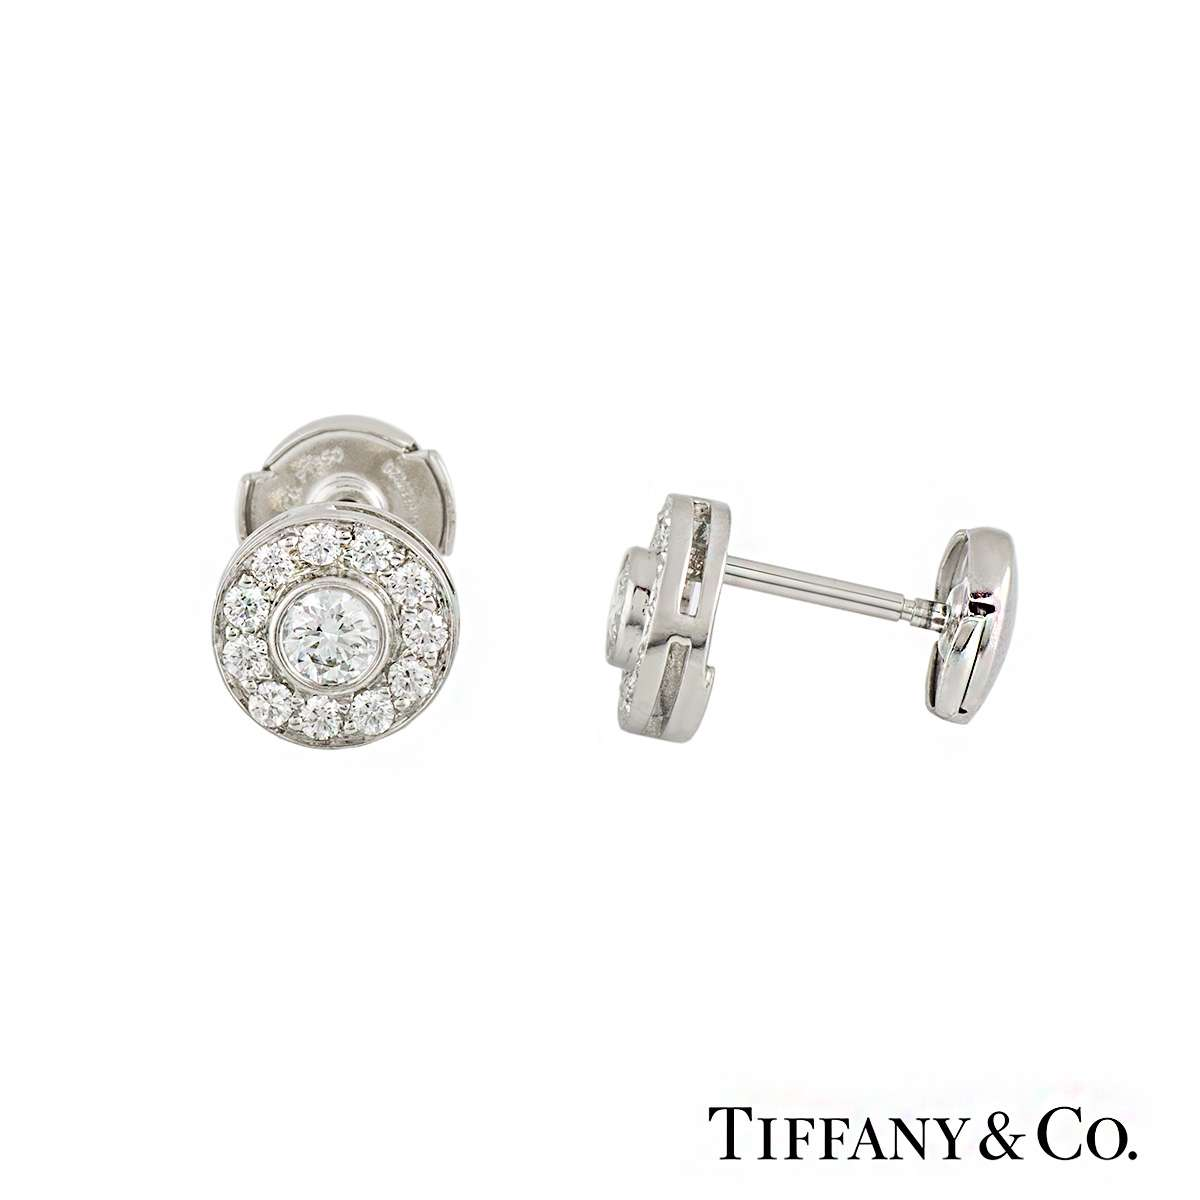 aa569fc5f Tiffany & Co Diamond Set Circlet Earstuds in Platinum 0.53ct - Rich ...